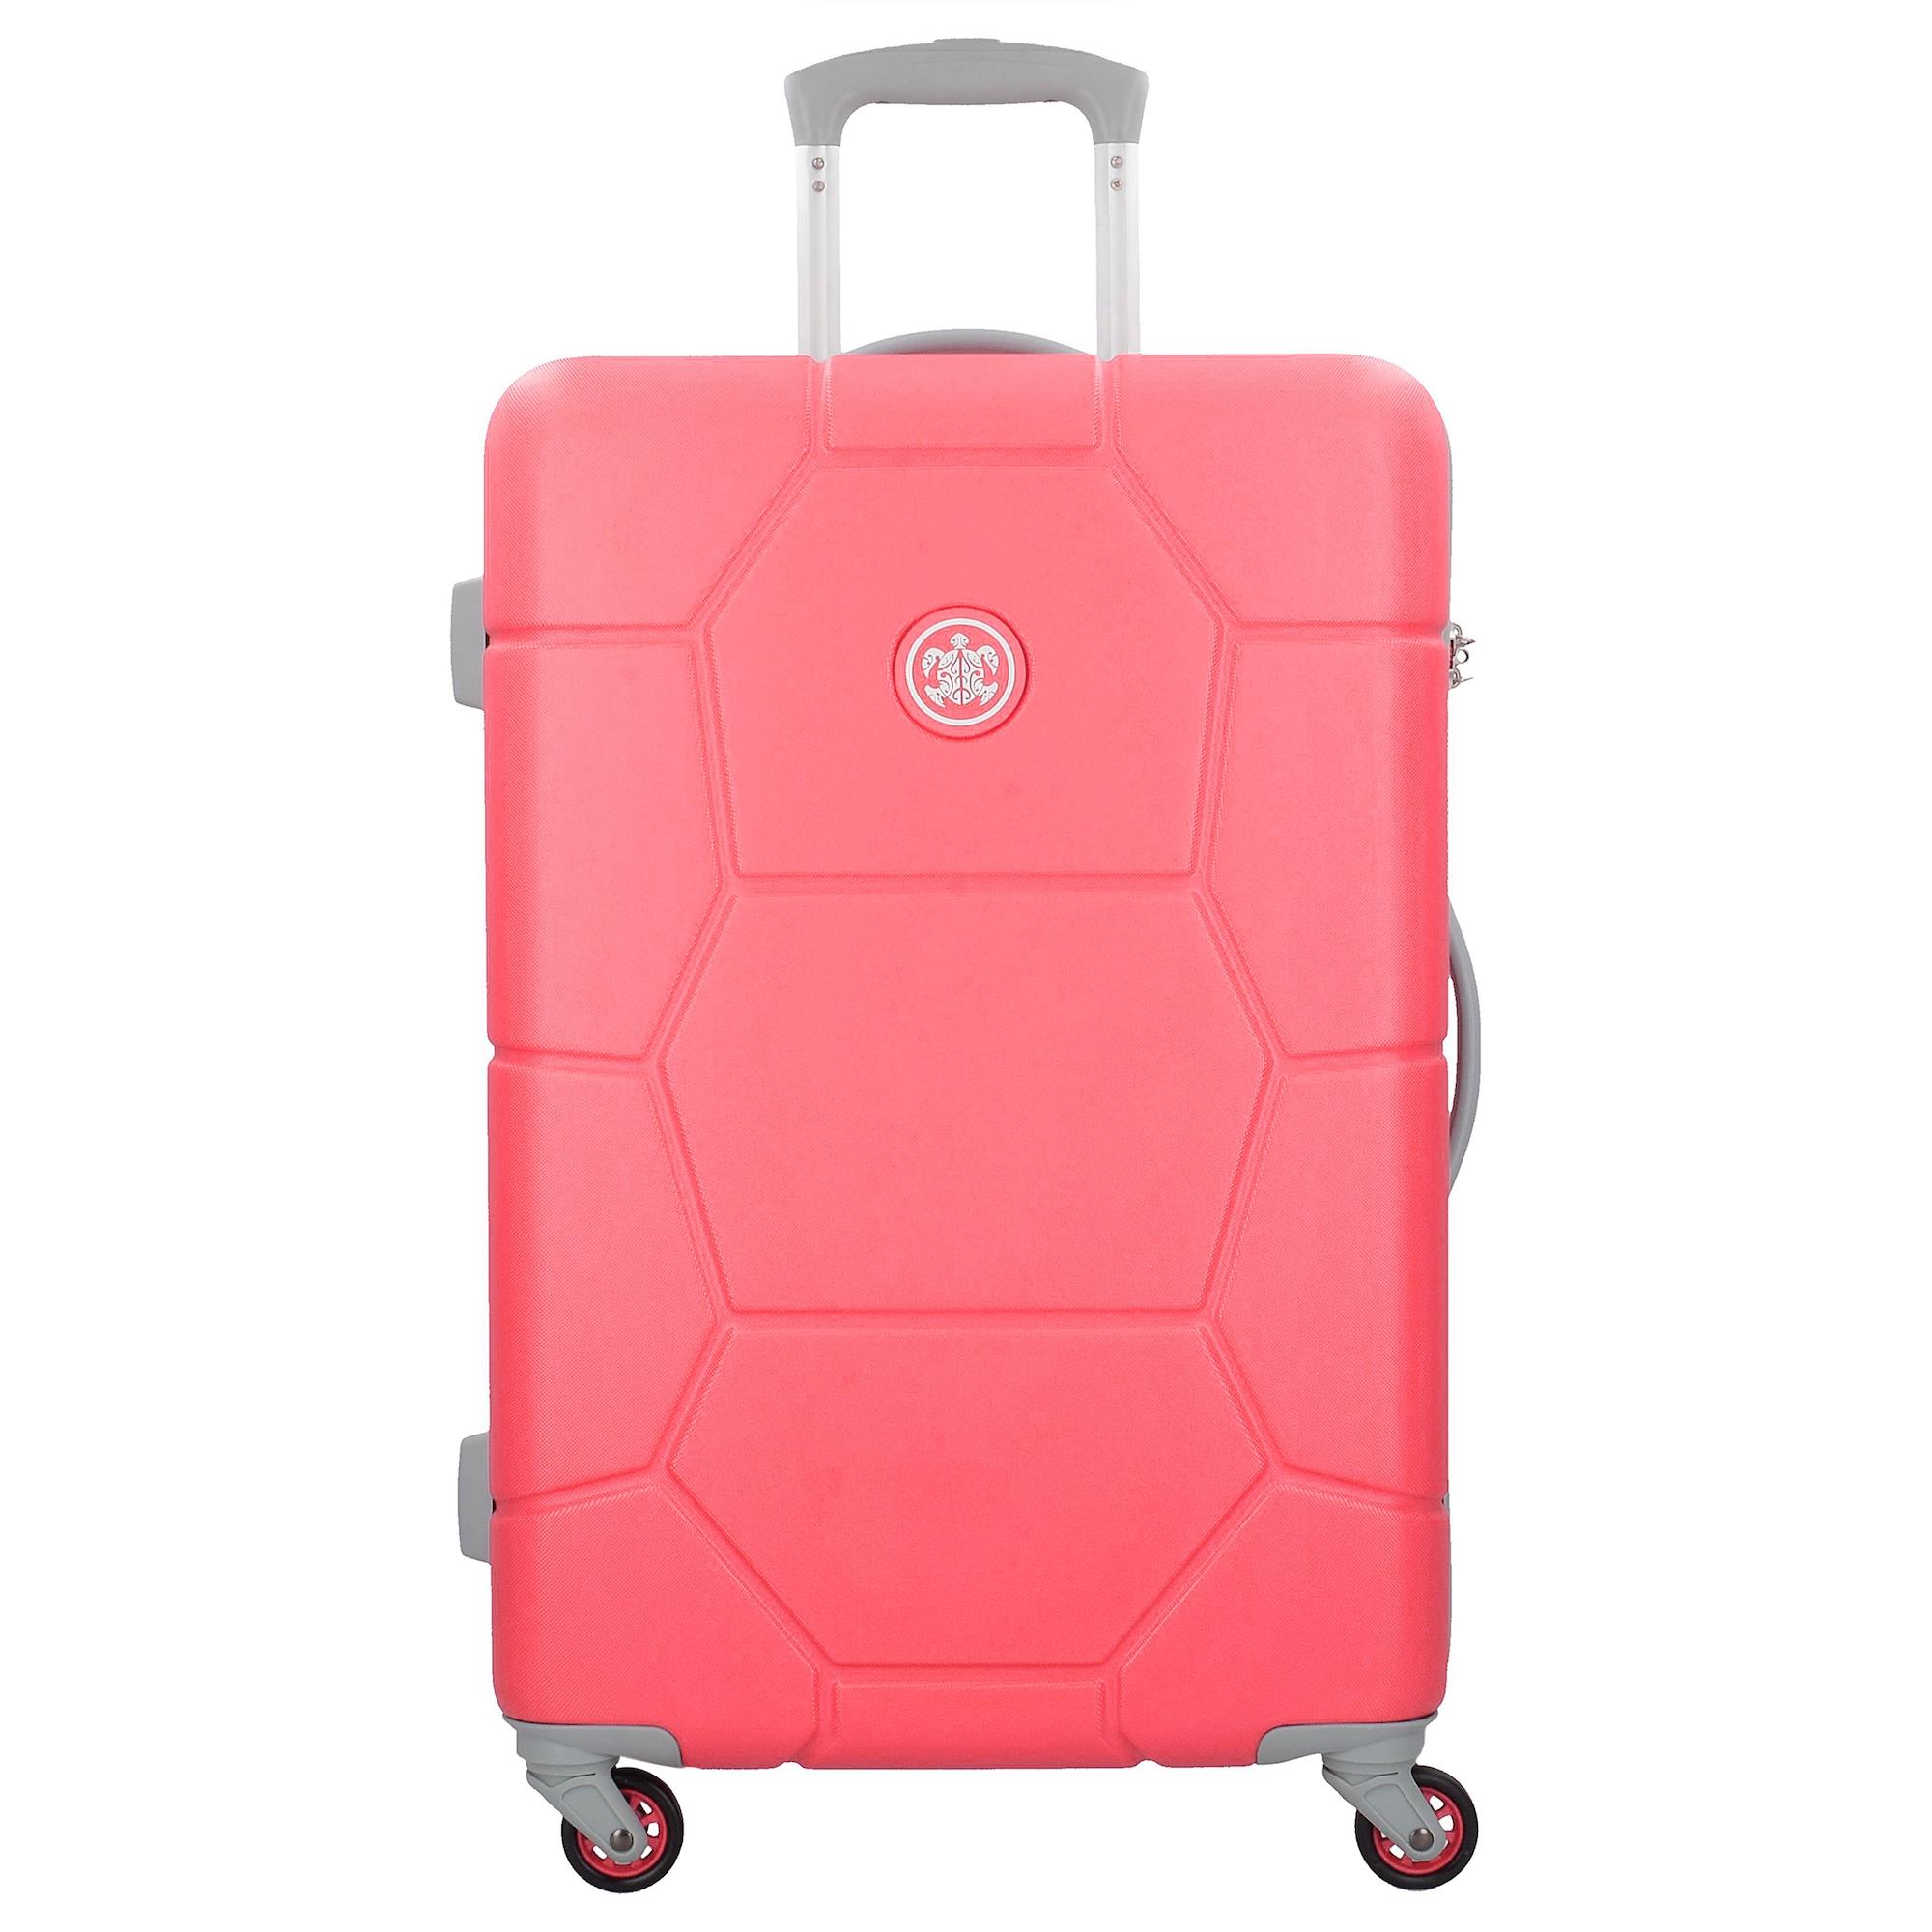 Trolley | Taschen > Koffer & Trolleys > Trolleys | Hellgrau | Suitsuit